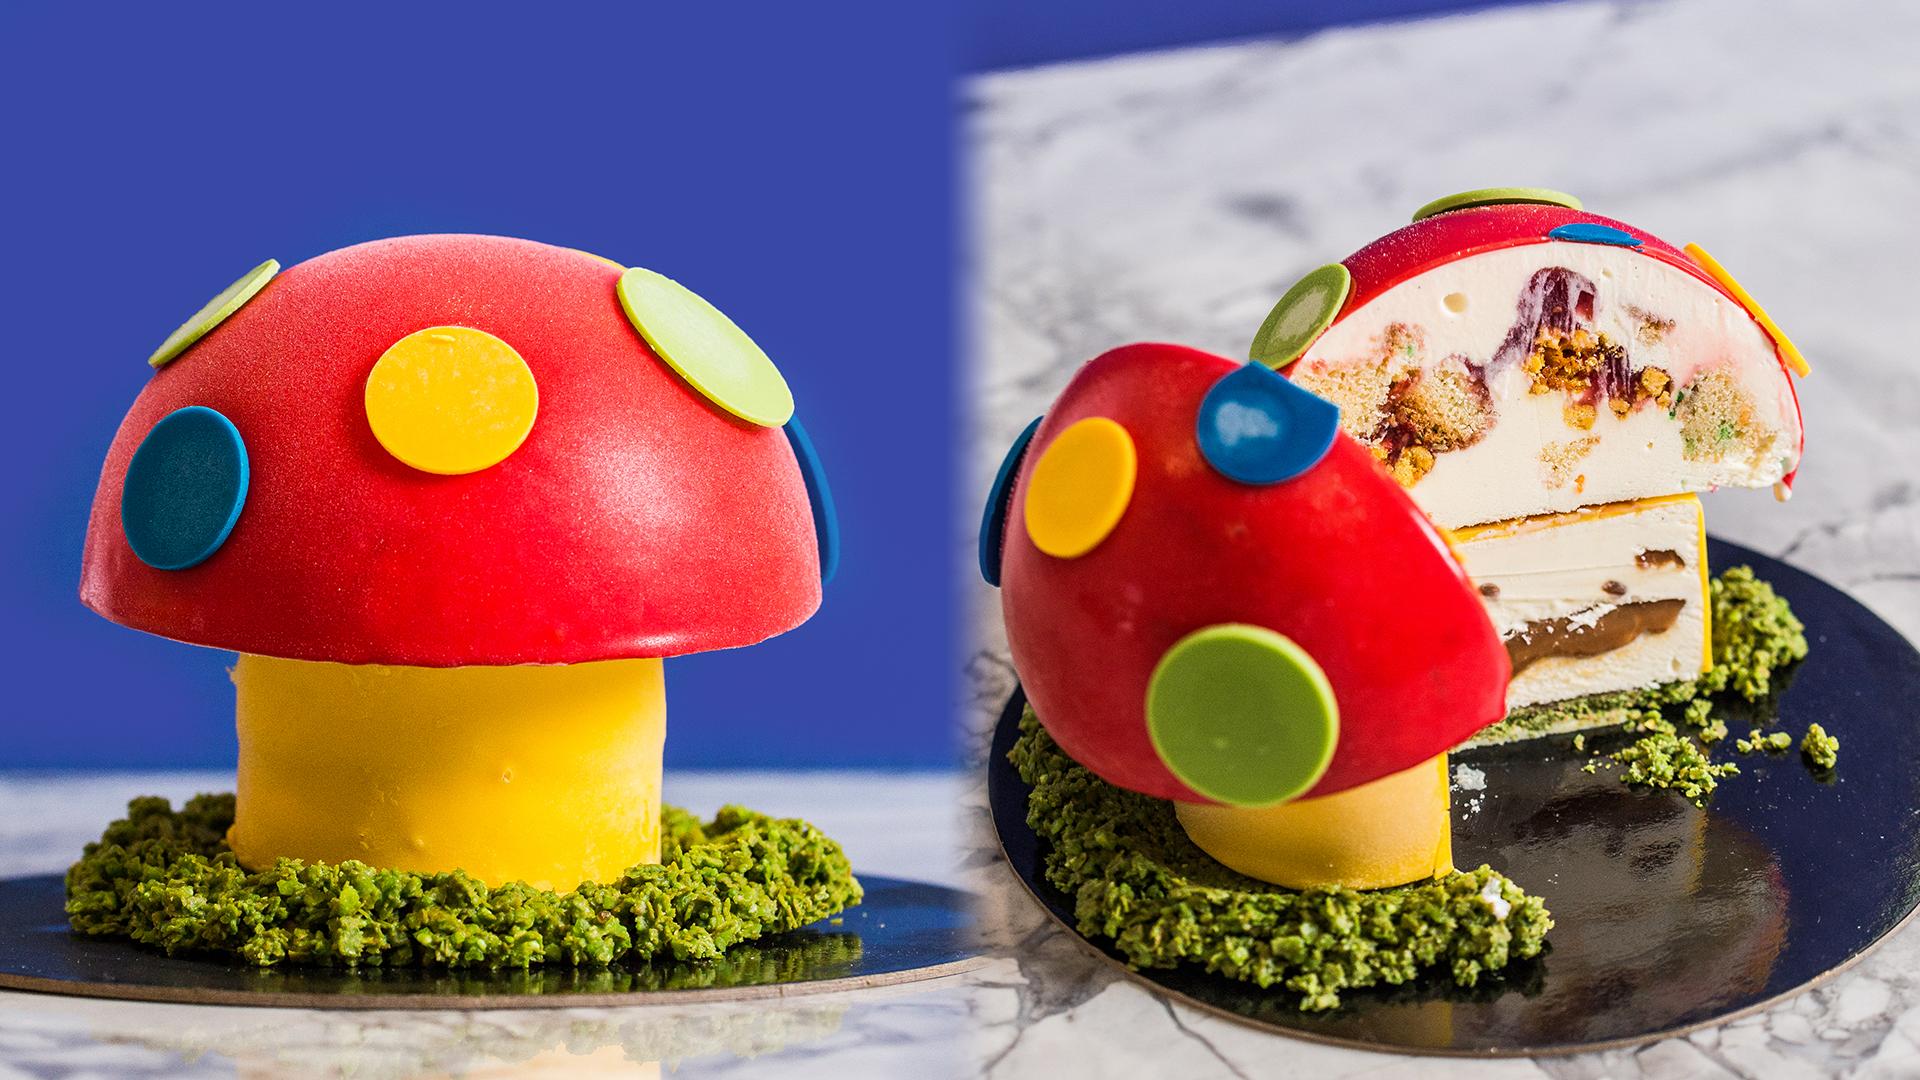 [Live] eBay Plus - Gelatto Messina Dr Evil Magic Mushroom Cake